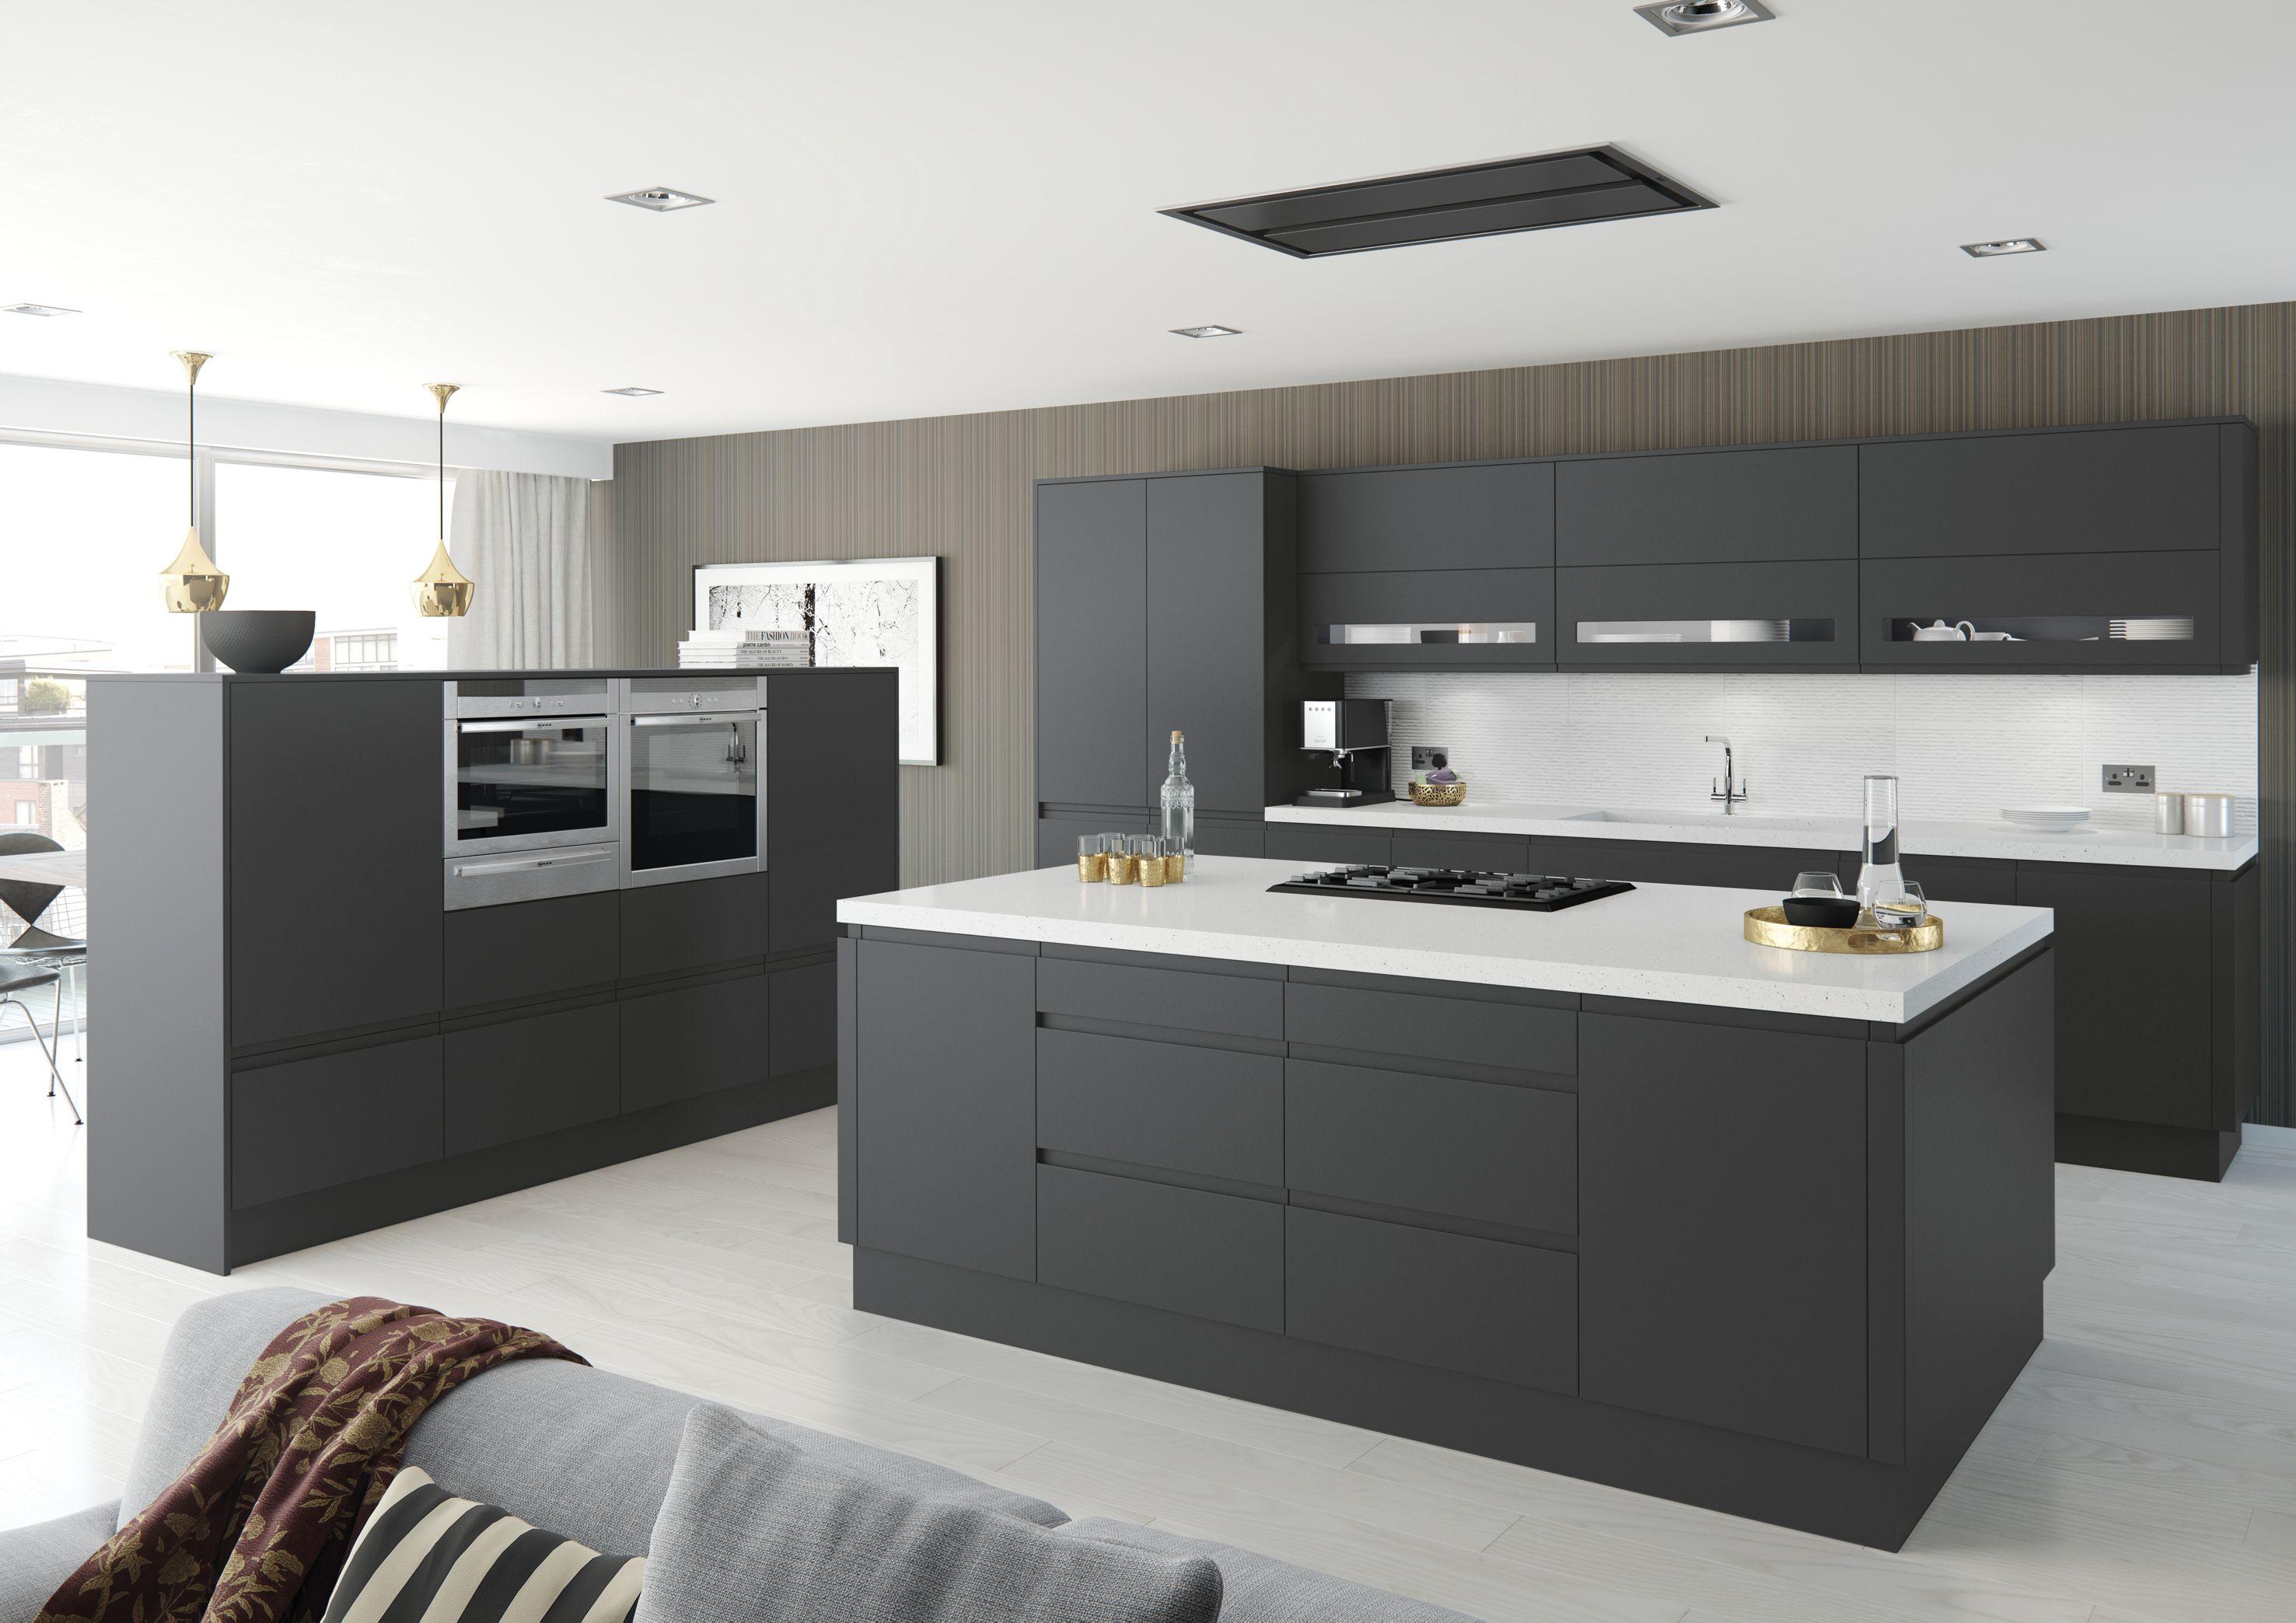 Moda Anthracite Kitchen Matt Handless Door Moda Kitchen Range Designer Kitchens For Less